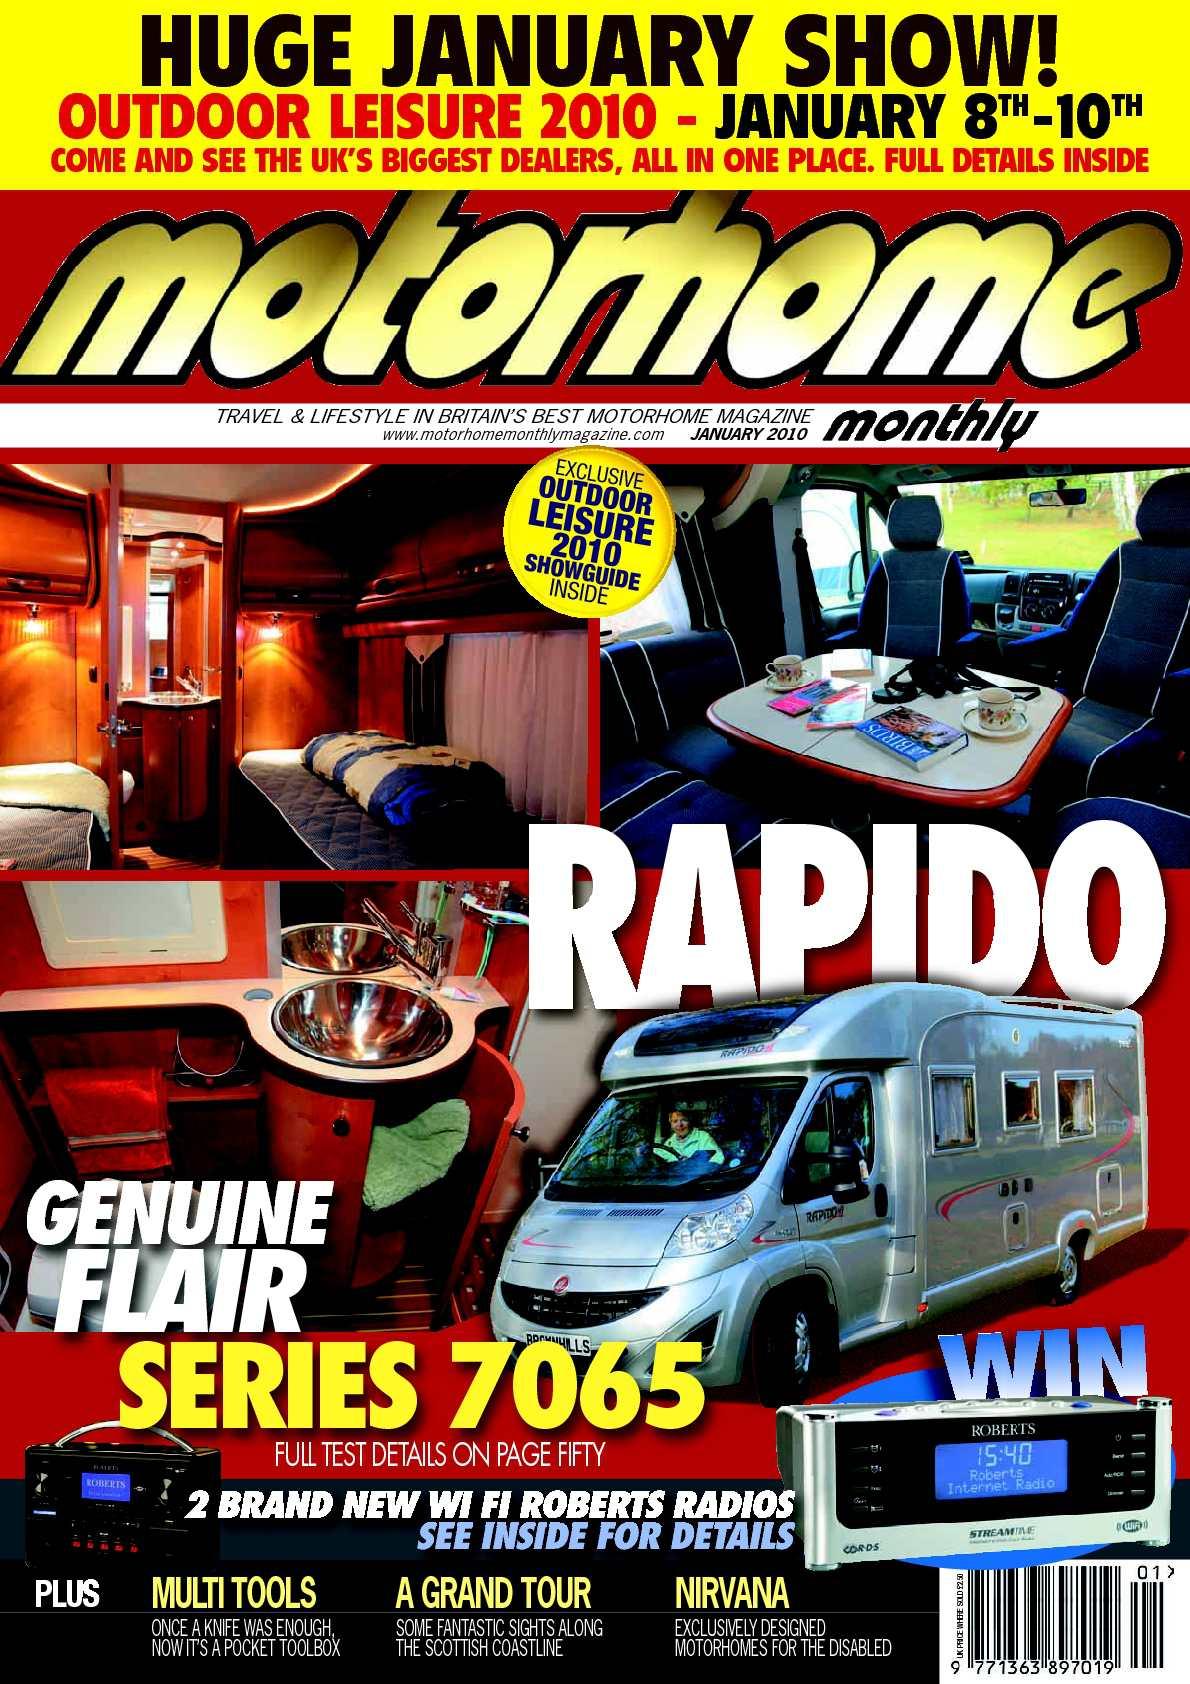 Whirlpool Garten Test Luxus Calaméo January 2010 Motorhome Monthly Magazine